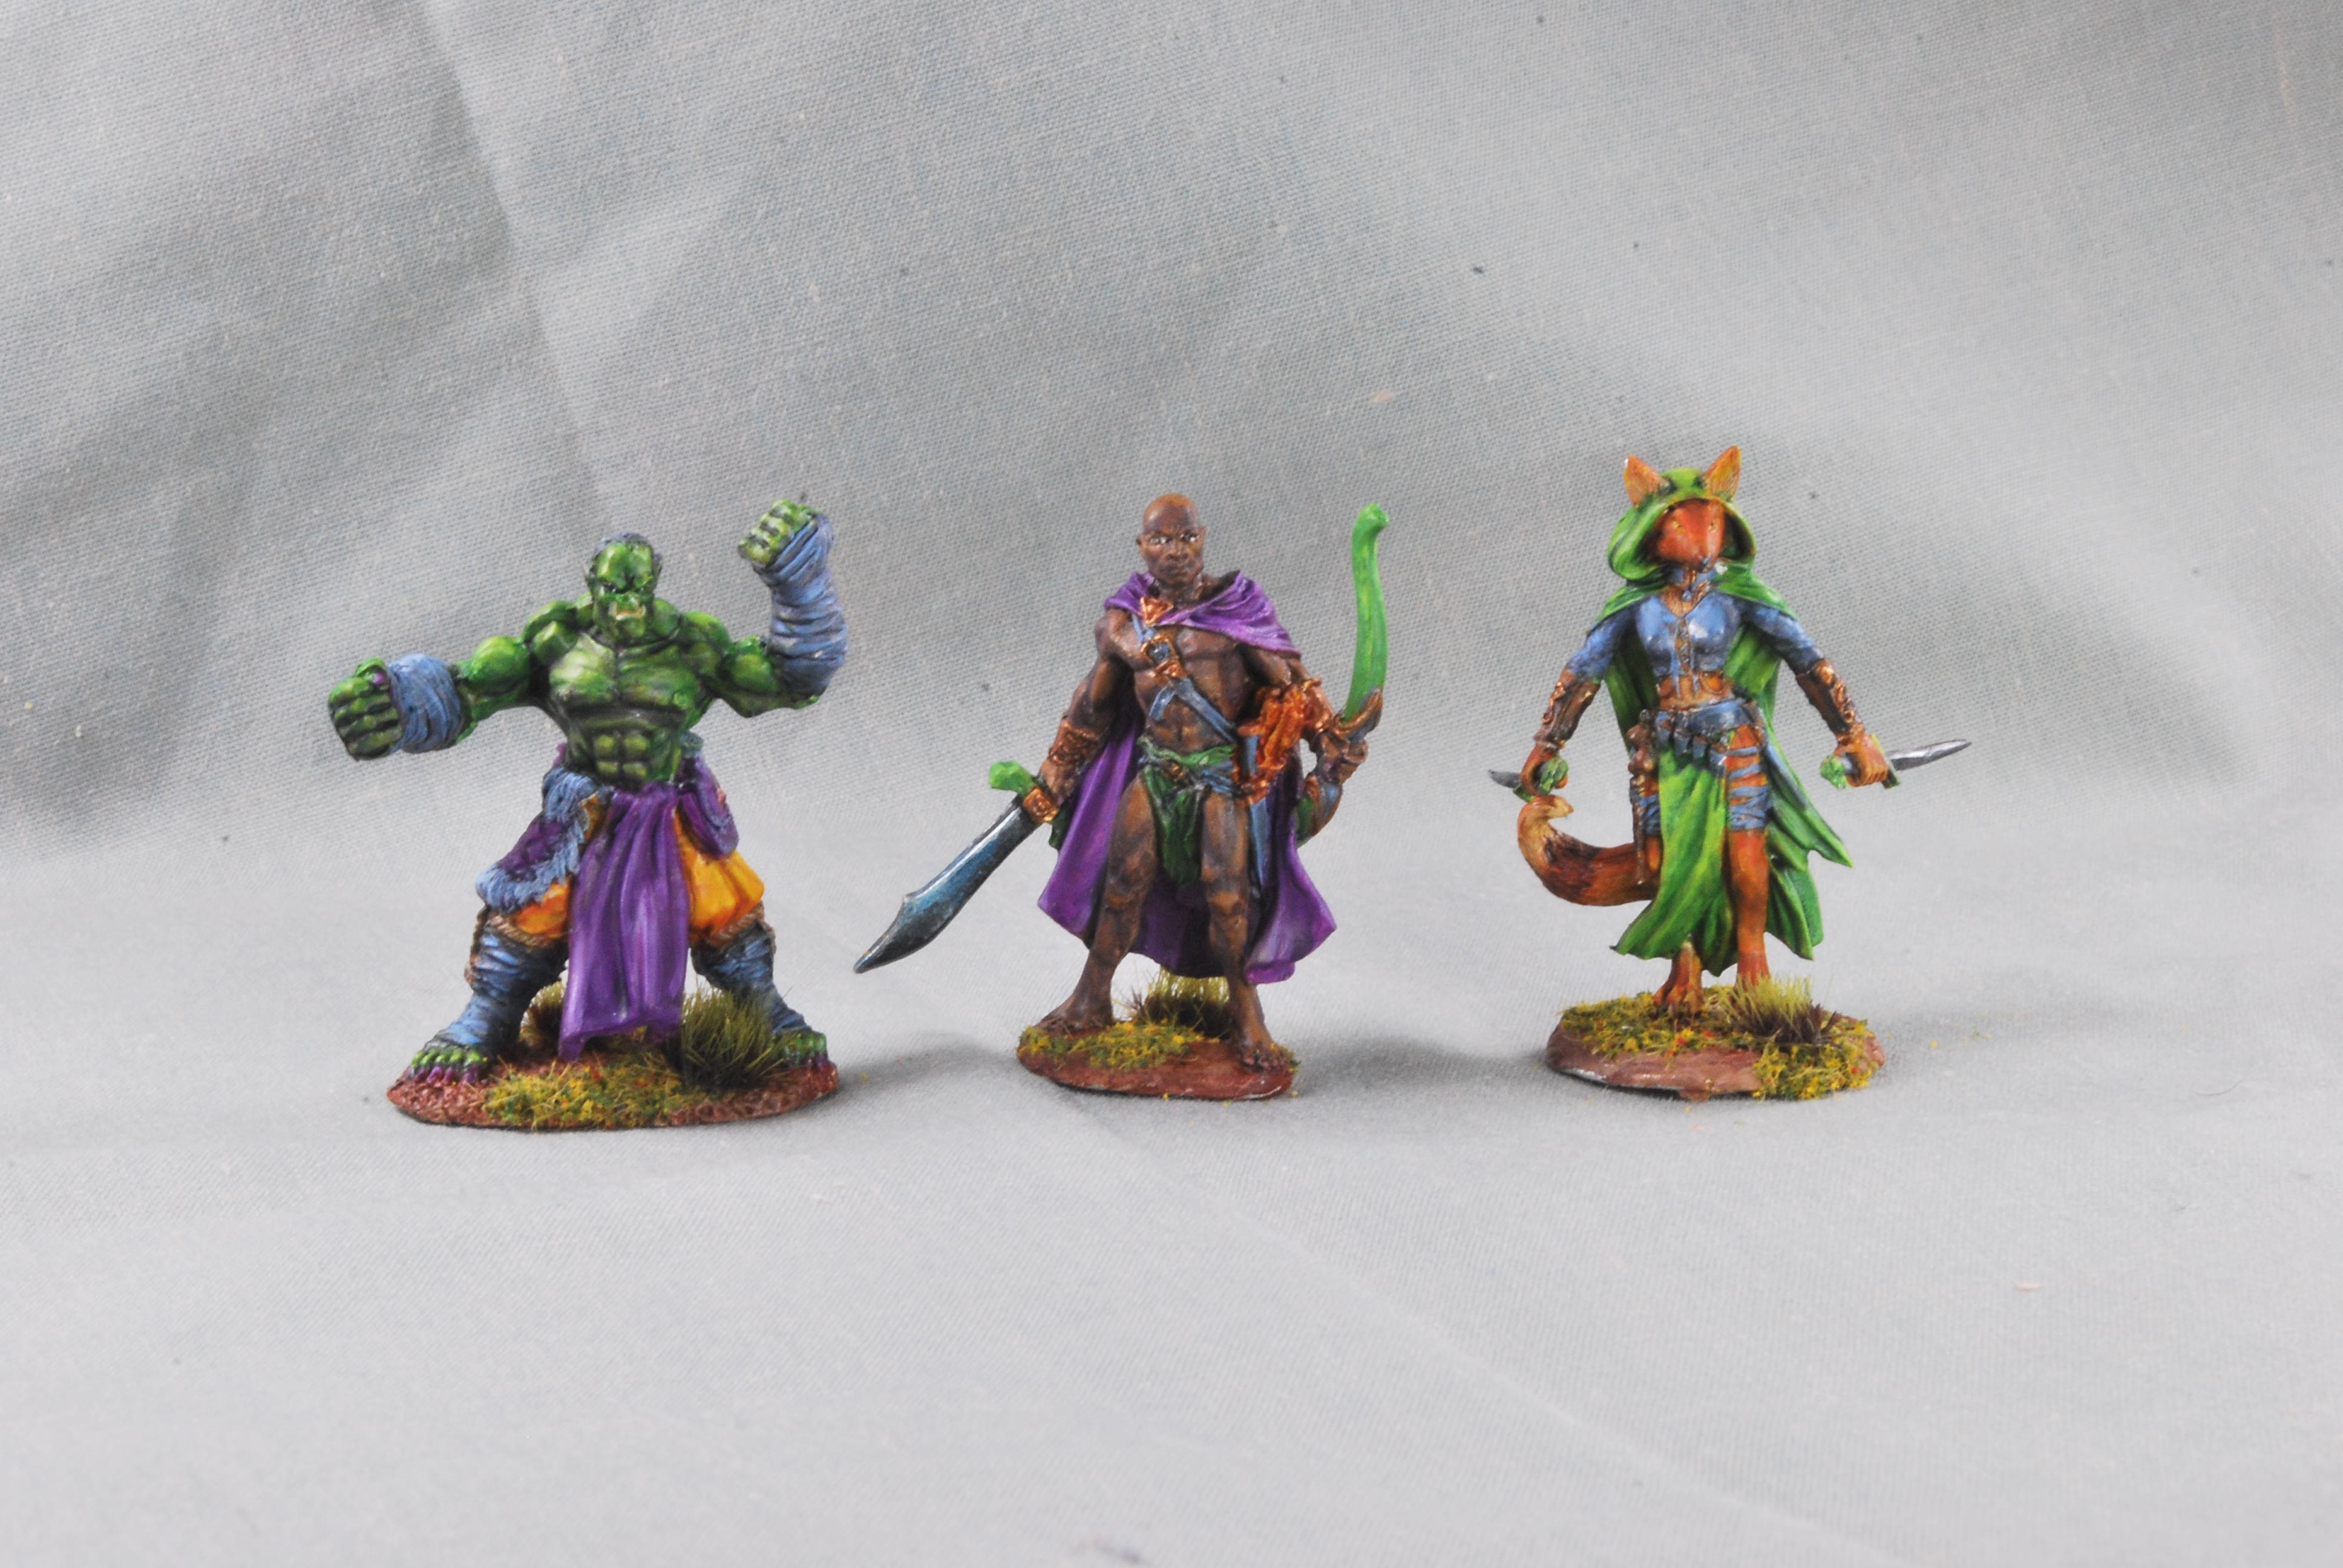 African Skin Tone, Dakka Painting Challenge 2020, Dark Sword Miniatures, Fox Folk, Green Skin Tone, Monk, Orcs, Rangers, Reaper, Rogue, Terrible Fur